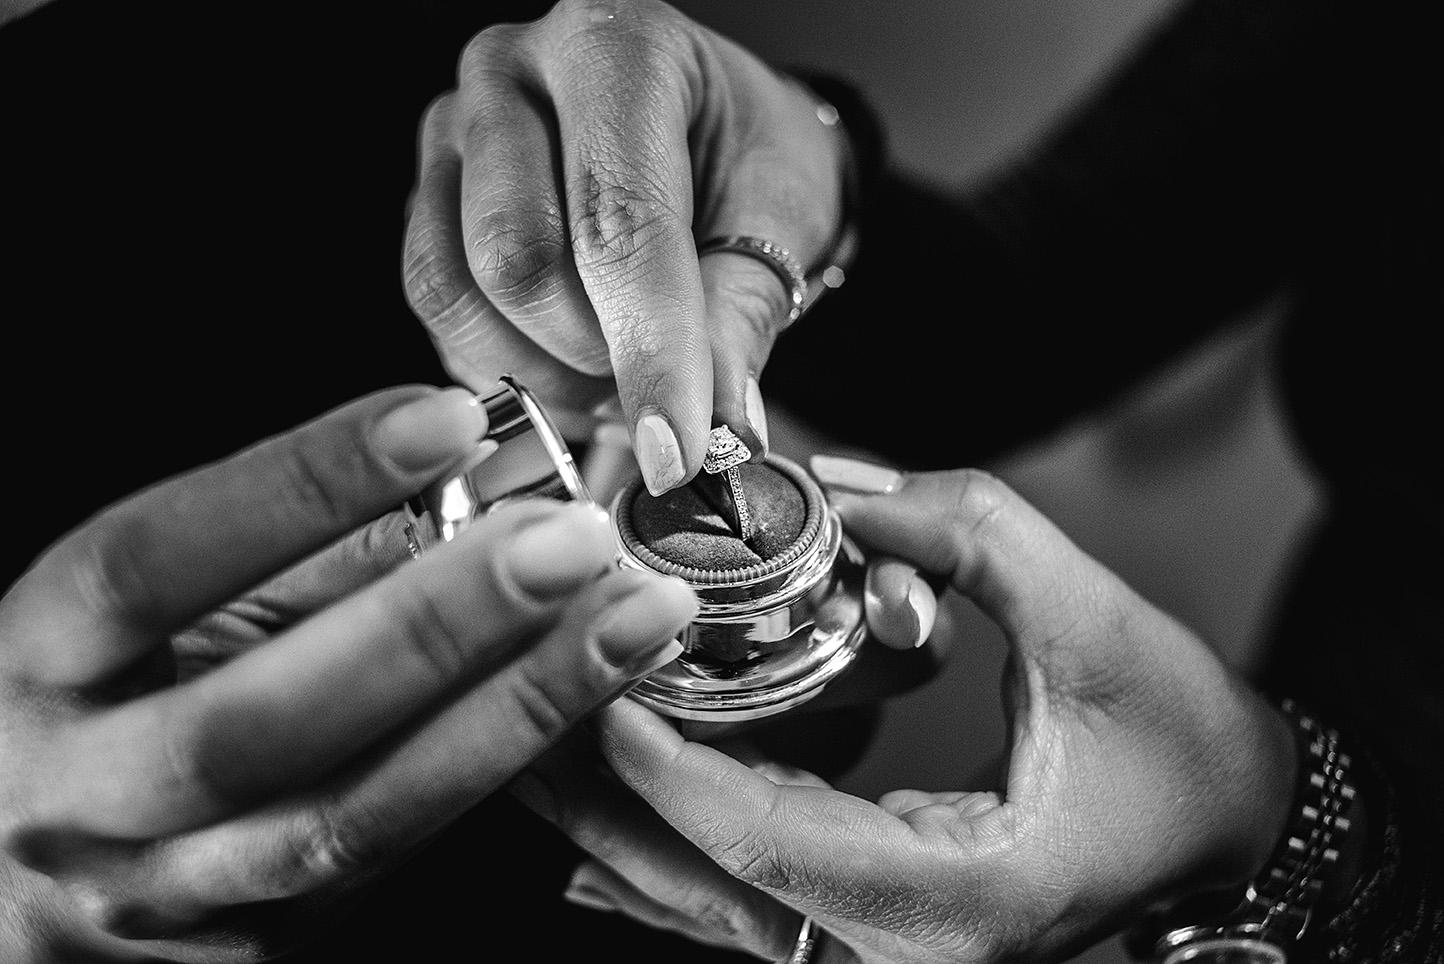 Next Restaurant Wedding Photoshoot | Shilan and Robin